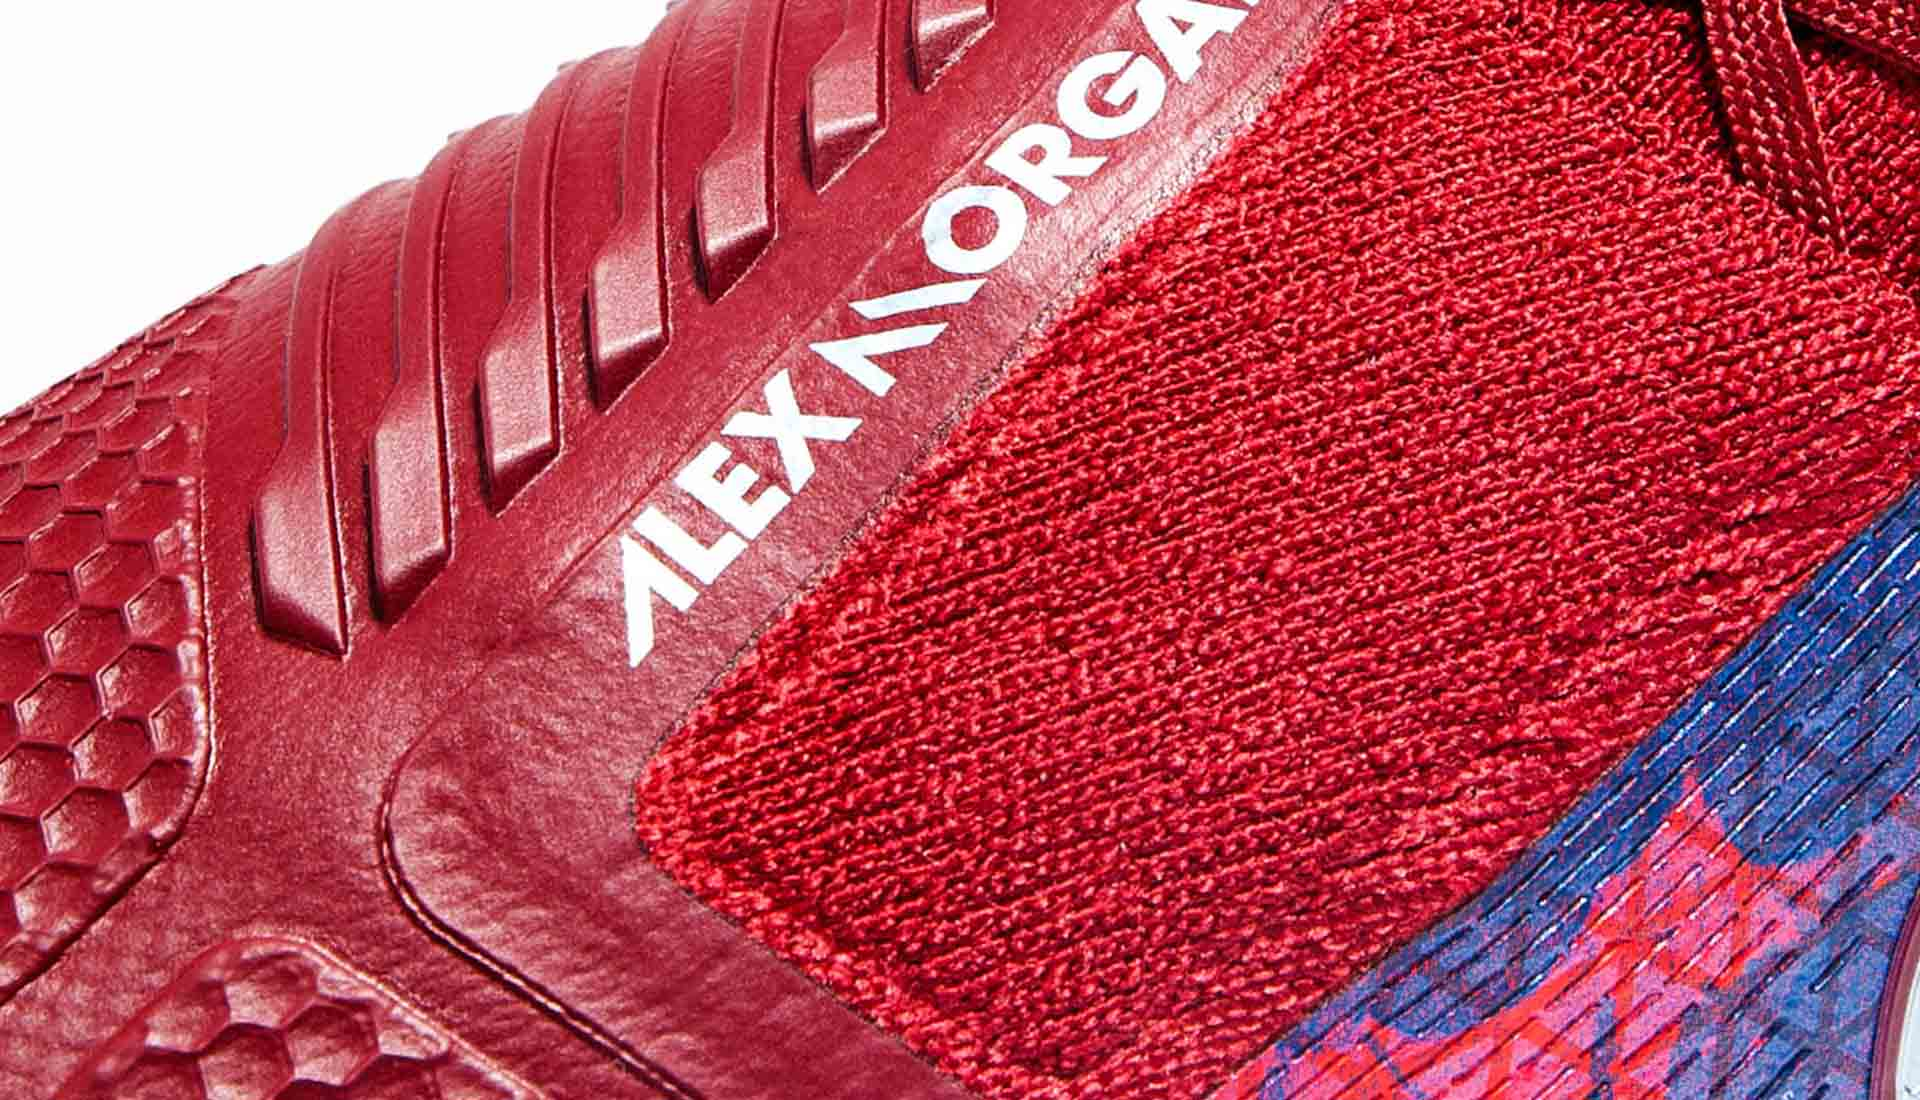 88a6d6dbd Nike Present Alex Morgan With Special-Edition PhantomVNM - SoccerBible